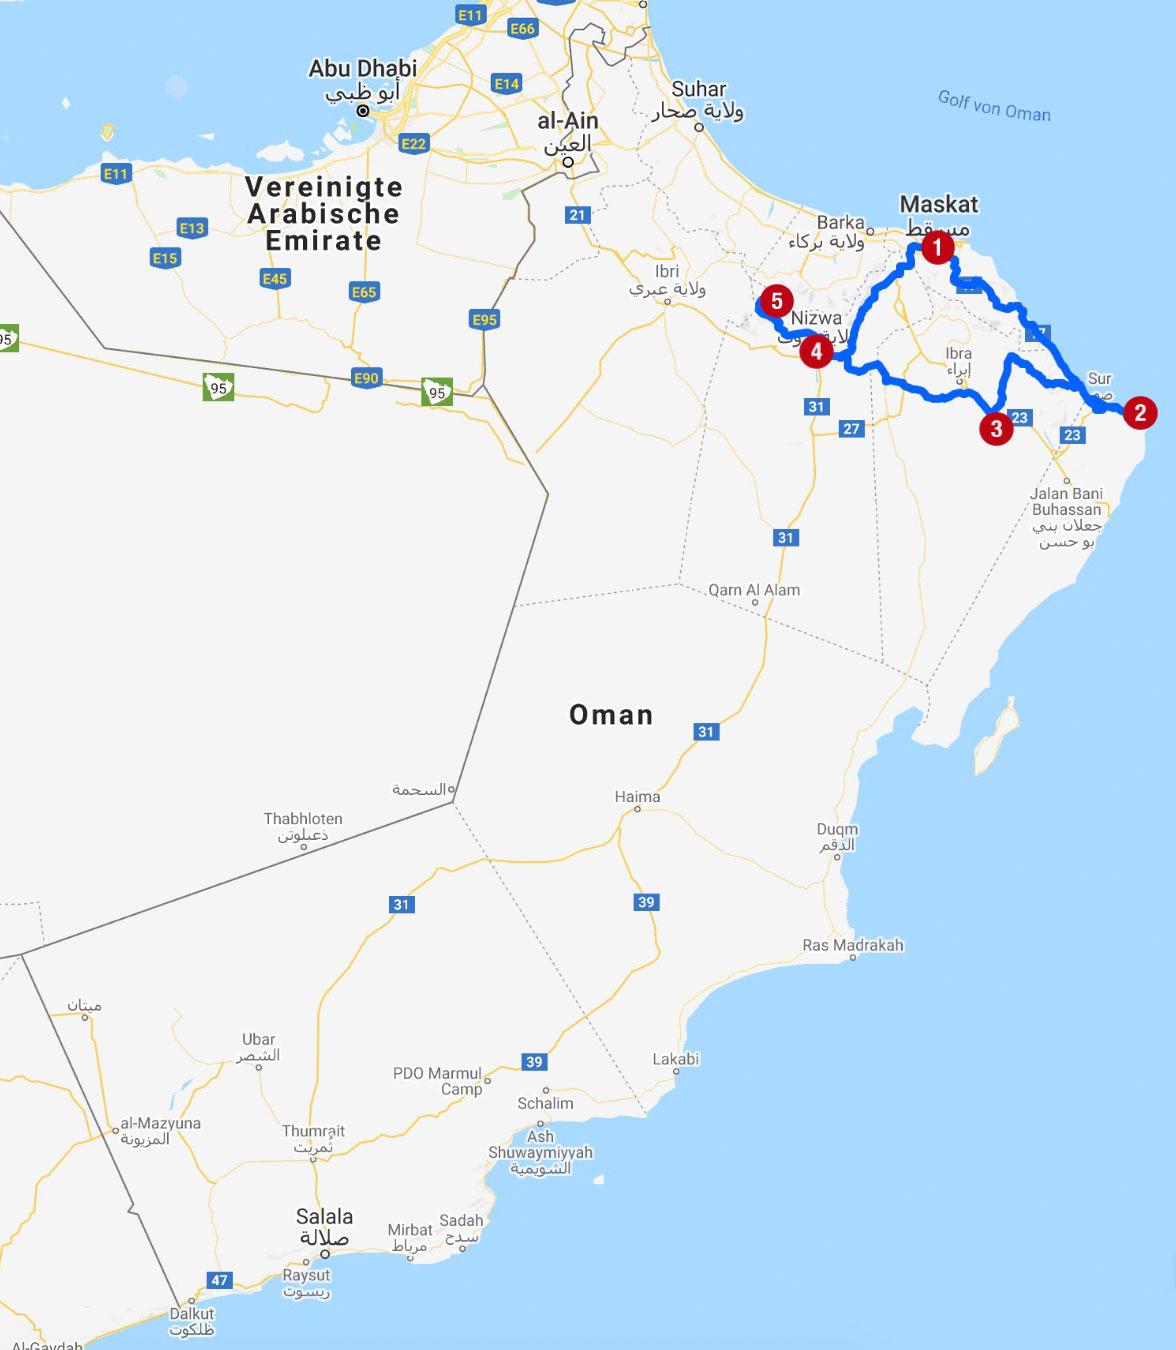 Karte mit Reiseroute im Oman